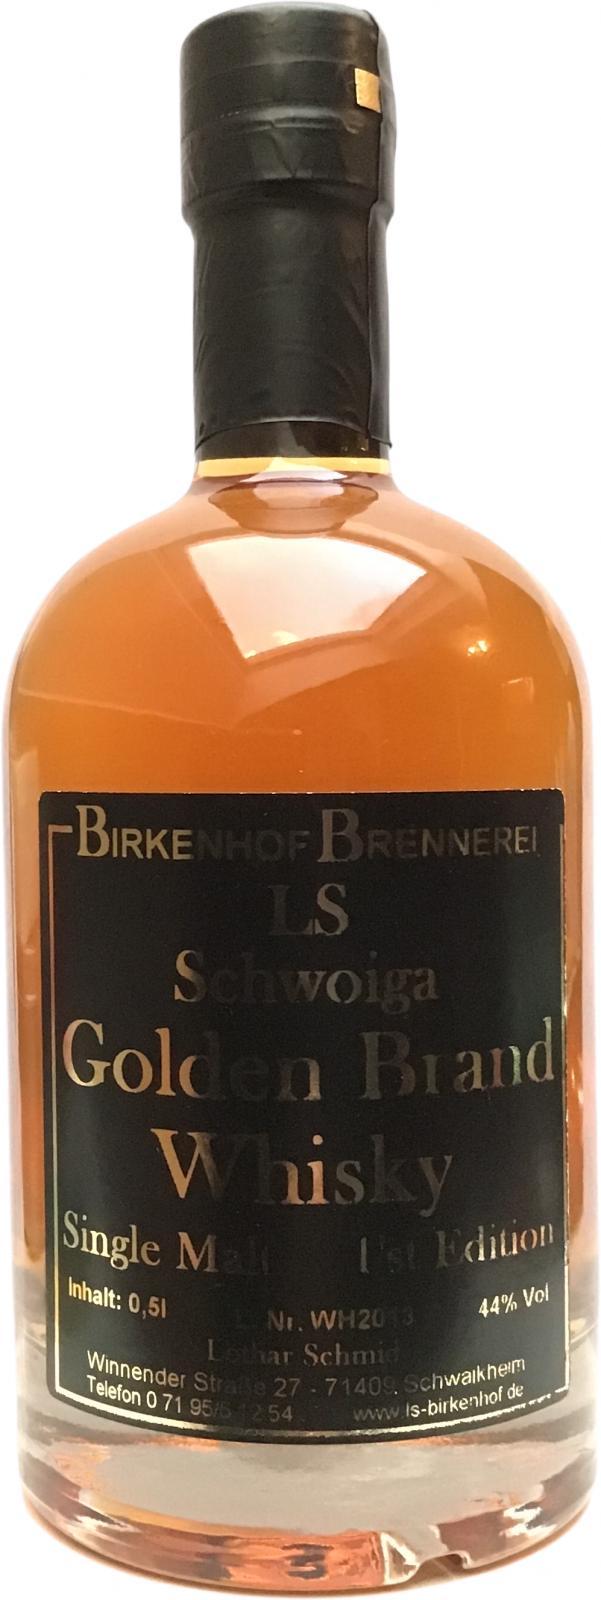 LS Schwoiga Golden Brand Whisky